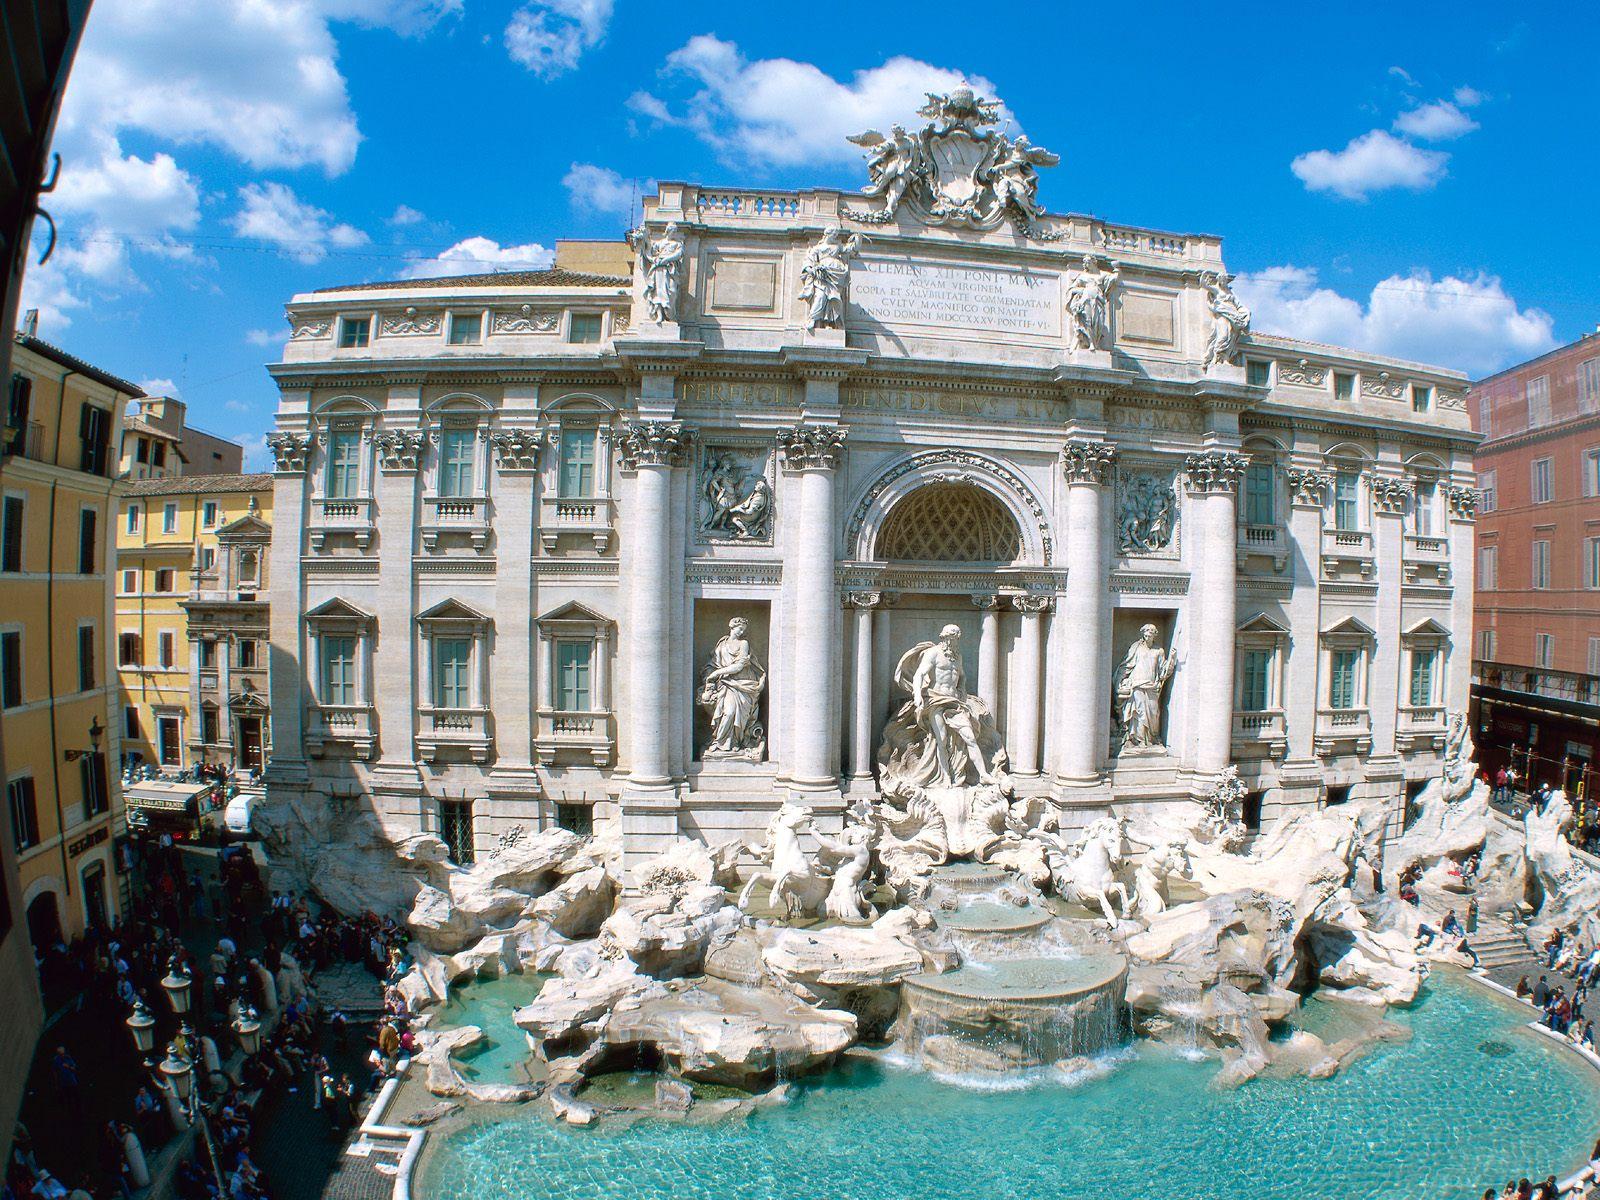 http://1.bp.blogspot.com/-ZOy7N_hAHTg/UA7C62-_6mI/AAAAAAAADzc/KZ_Vntb-Ry8/s1600/Trevi+Fountain,+Rome,+Italy+-+1600x1200+-+ID+39589+-+PREMIUM.jpg